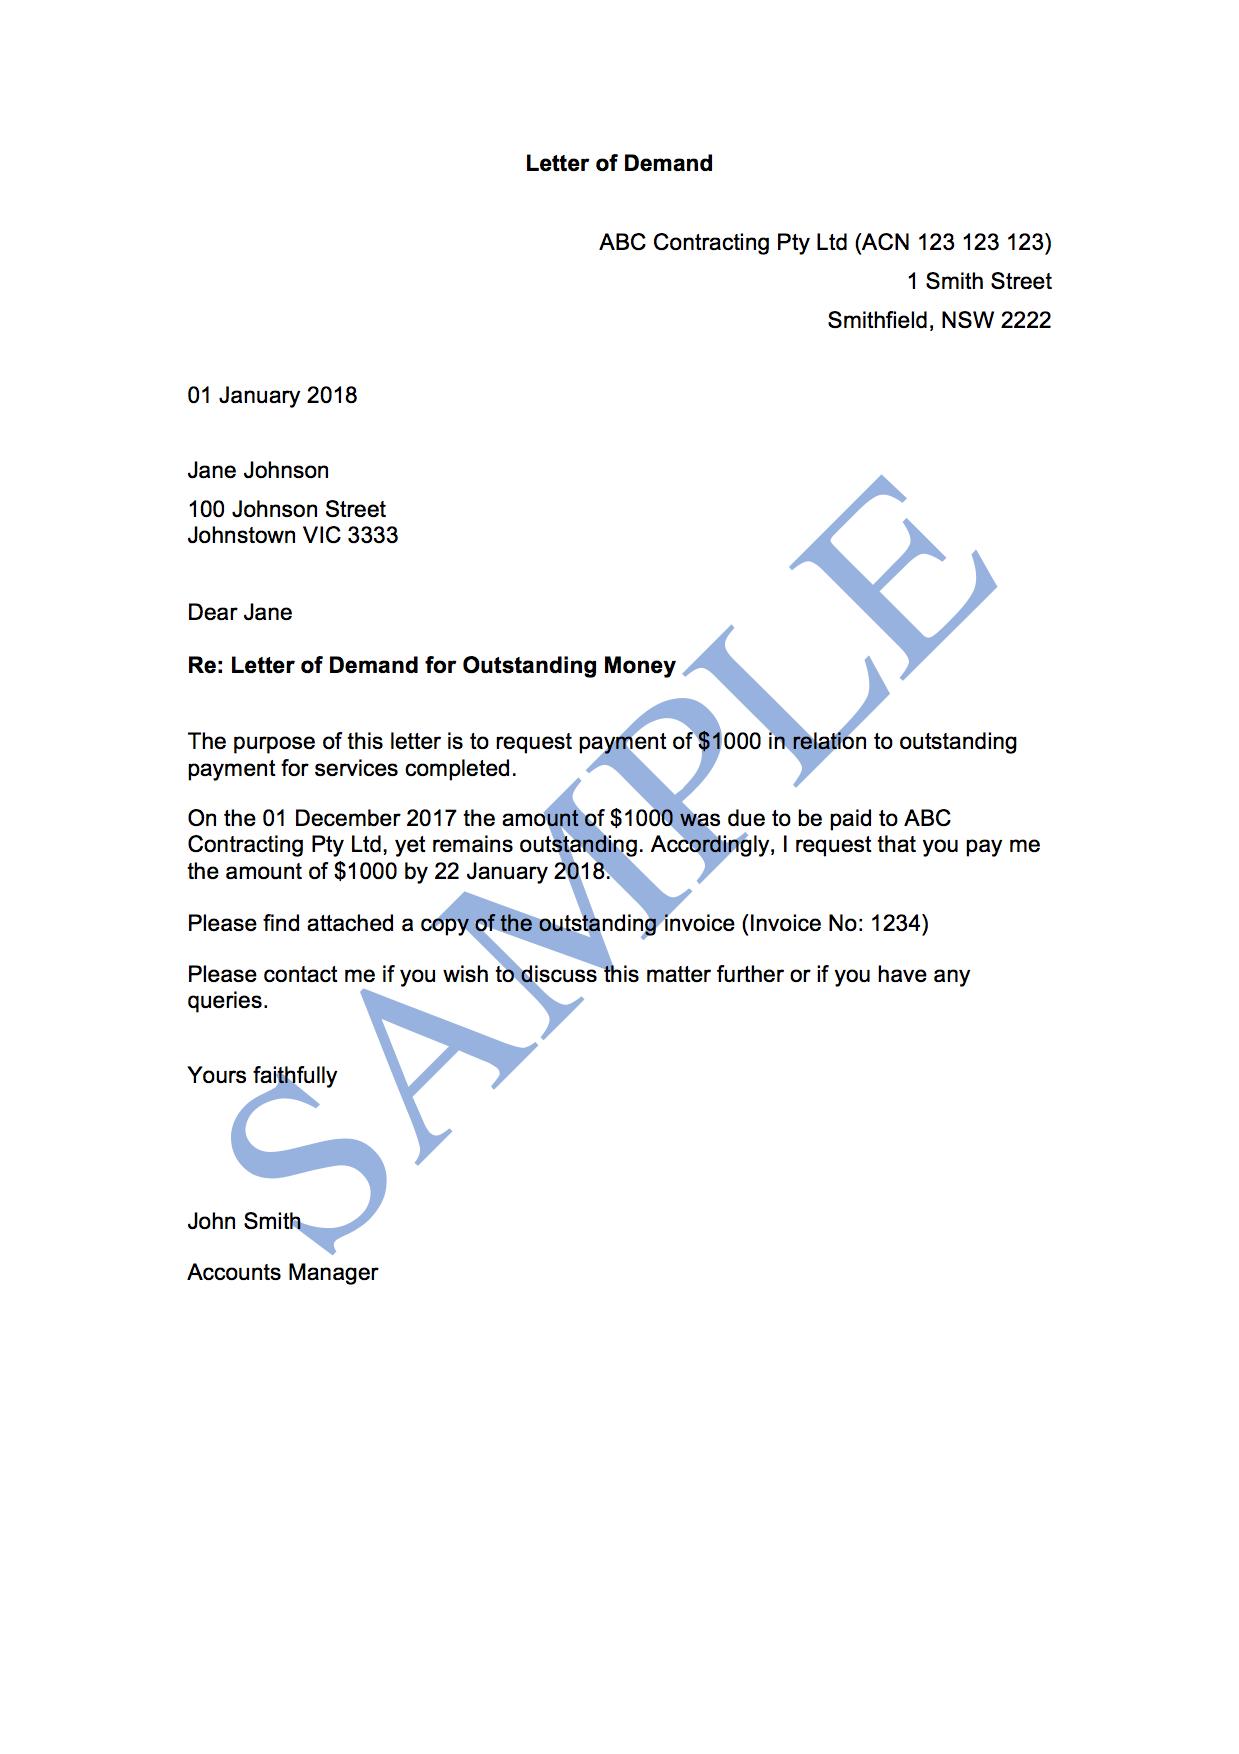 Sample Letter Of Demand from lp-public-images.s3-ap-southeast-2.amazonaws.com